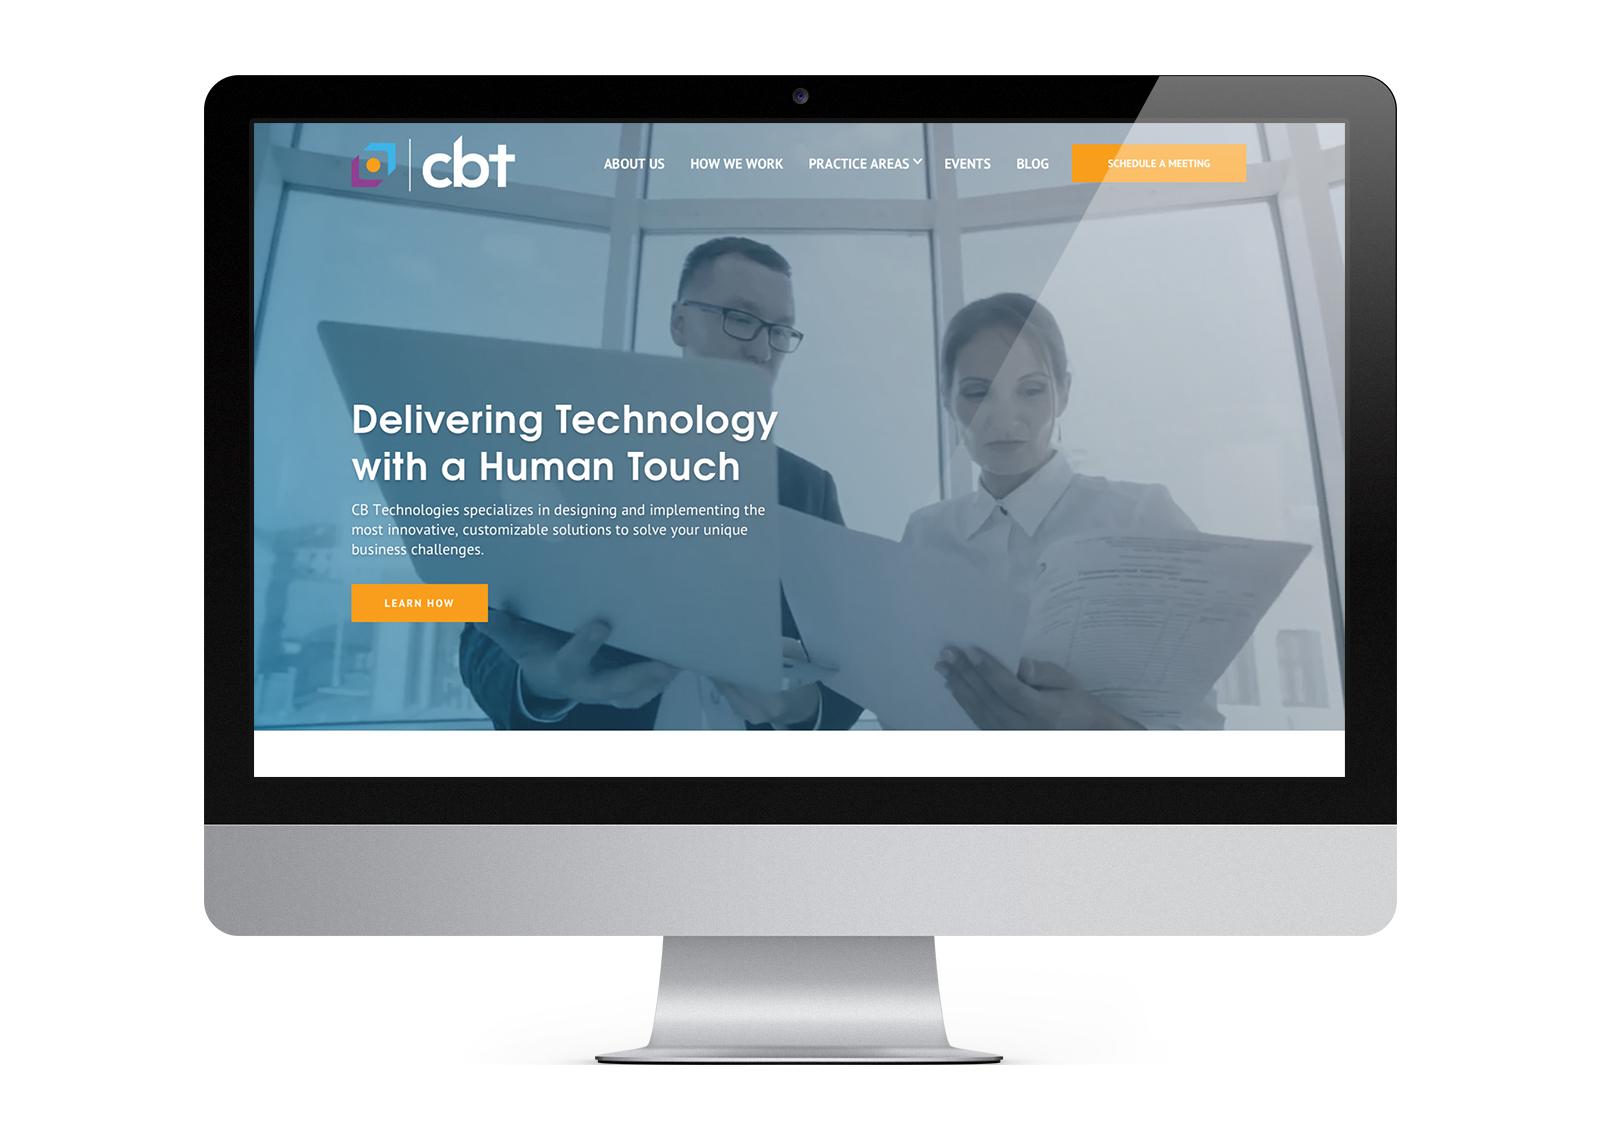 cbt website design